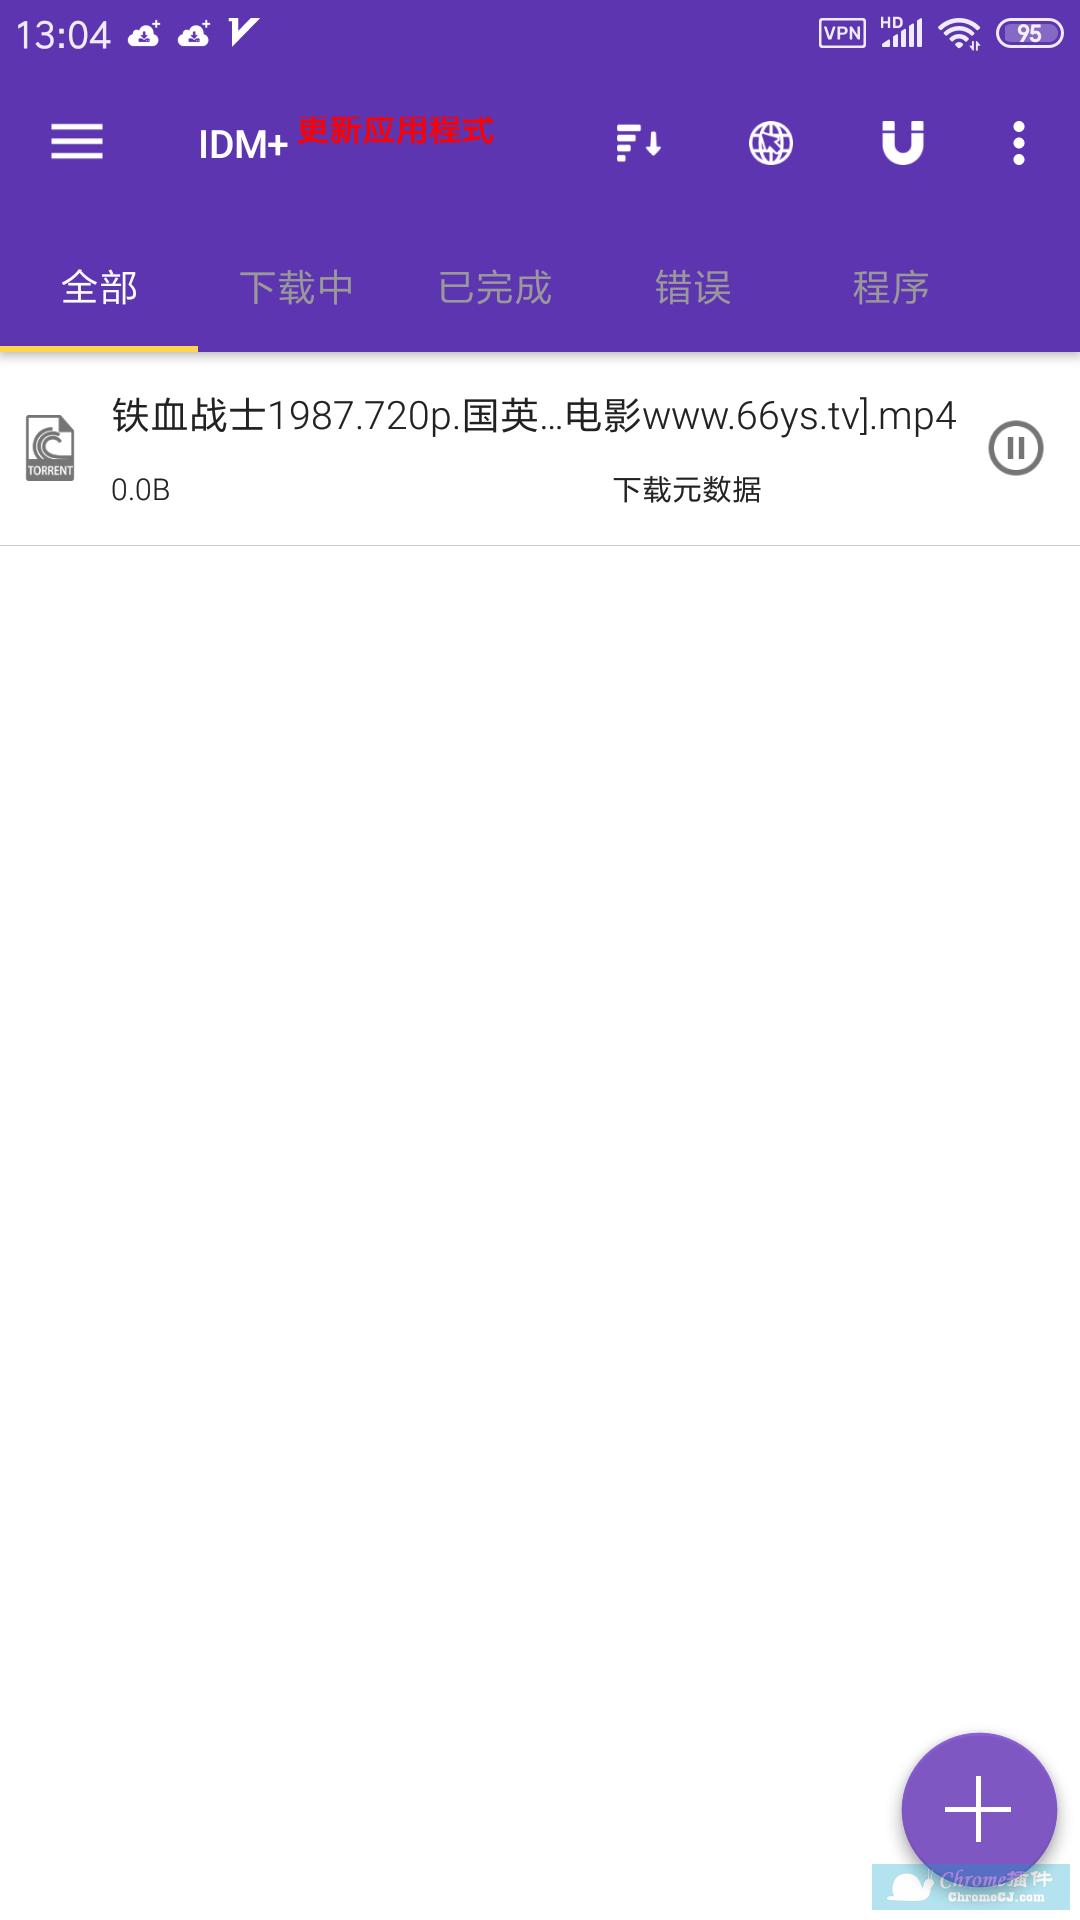 IDM+ 不限速多线程下载神器安卓版下载